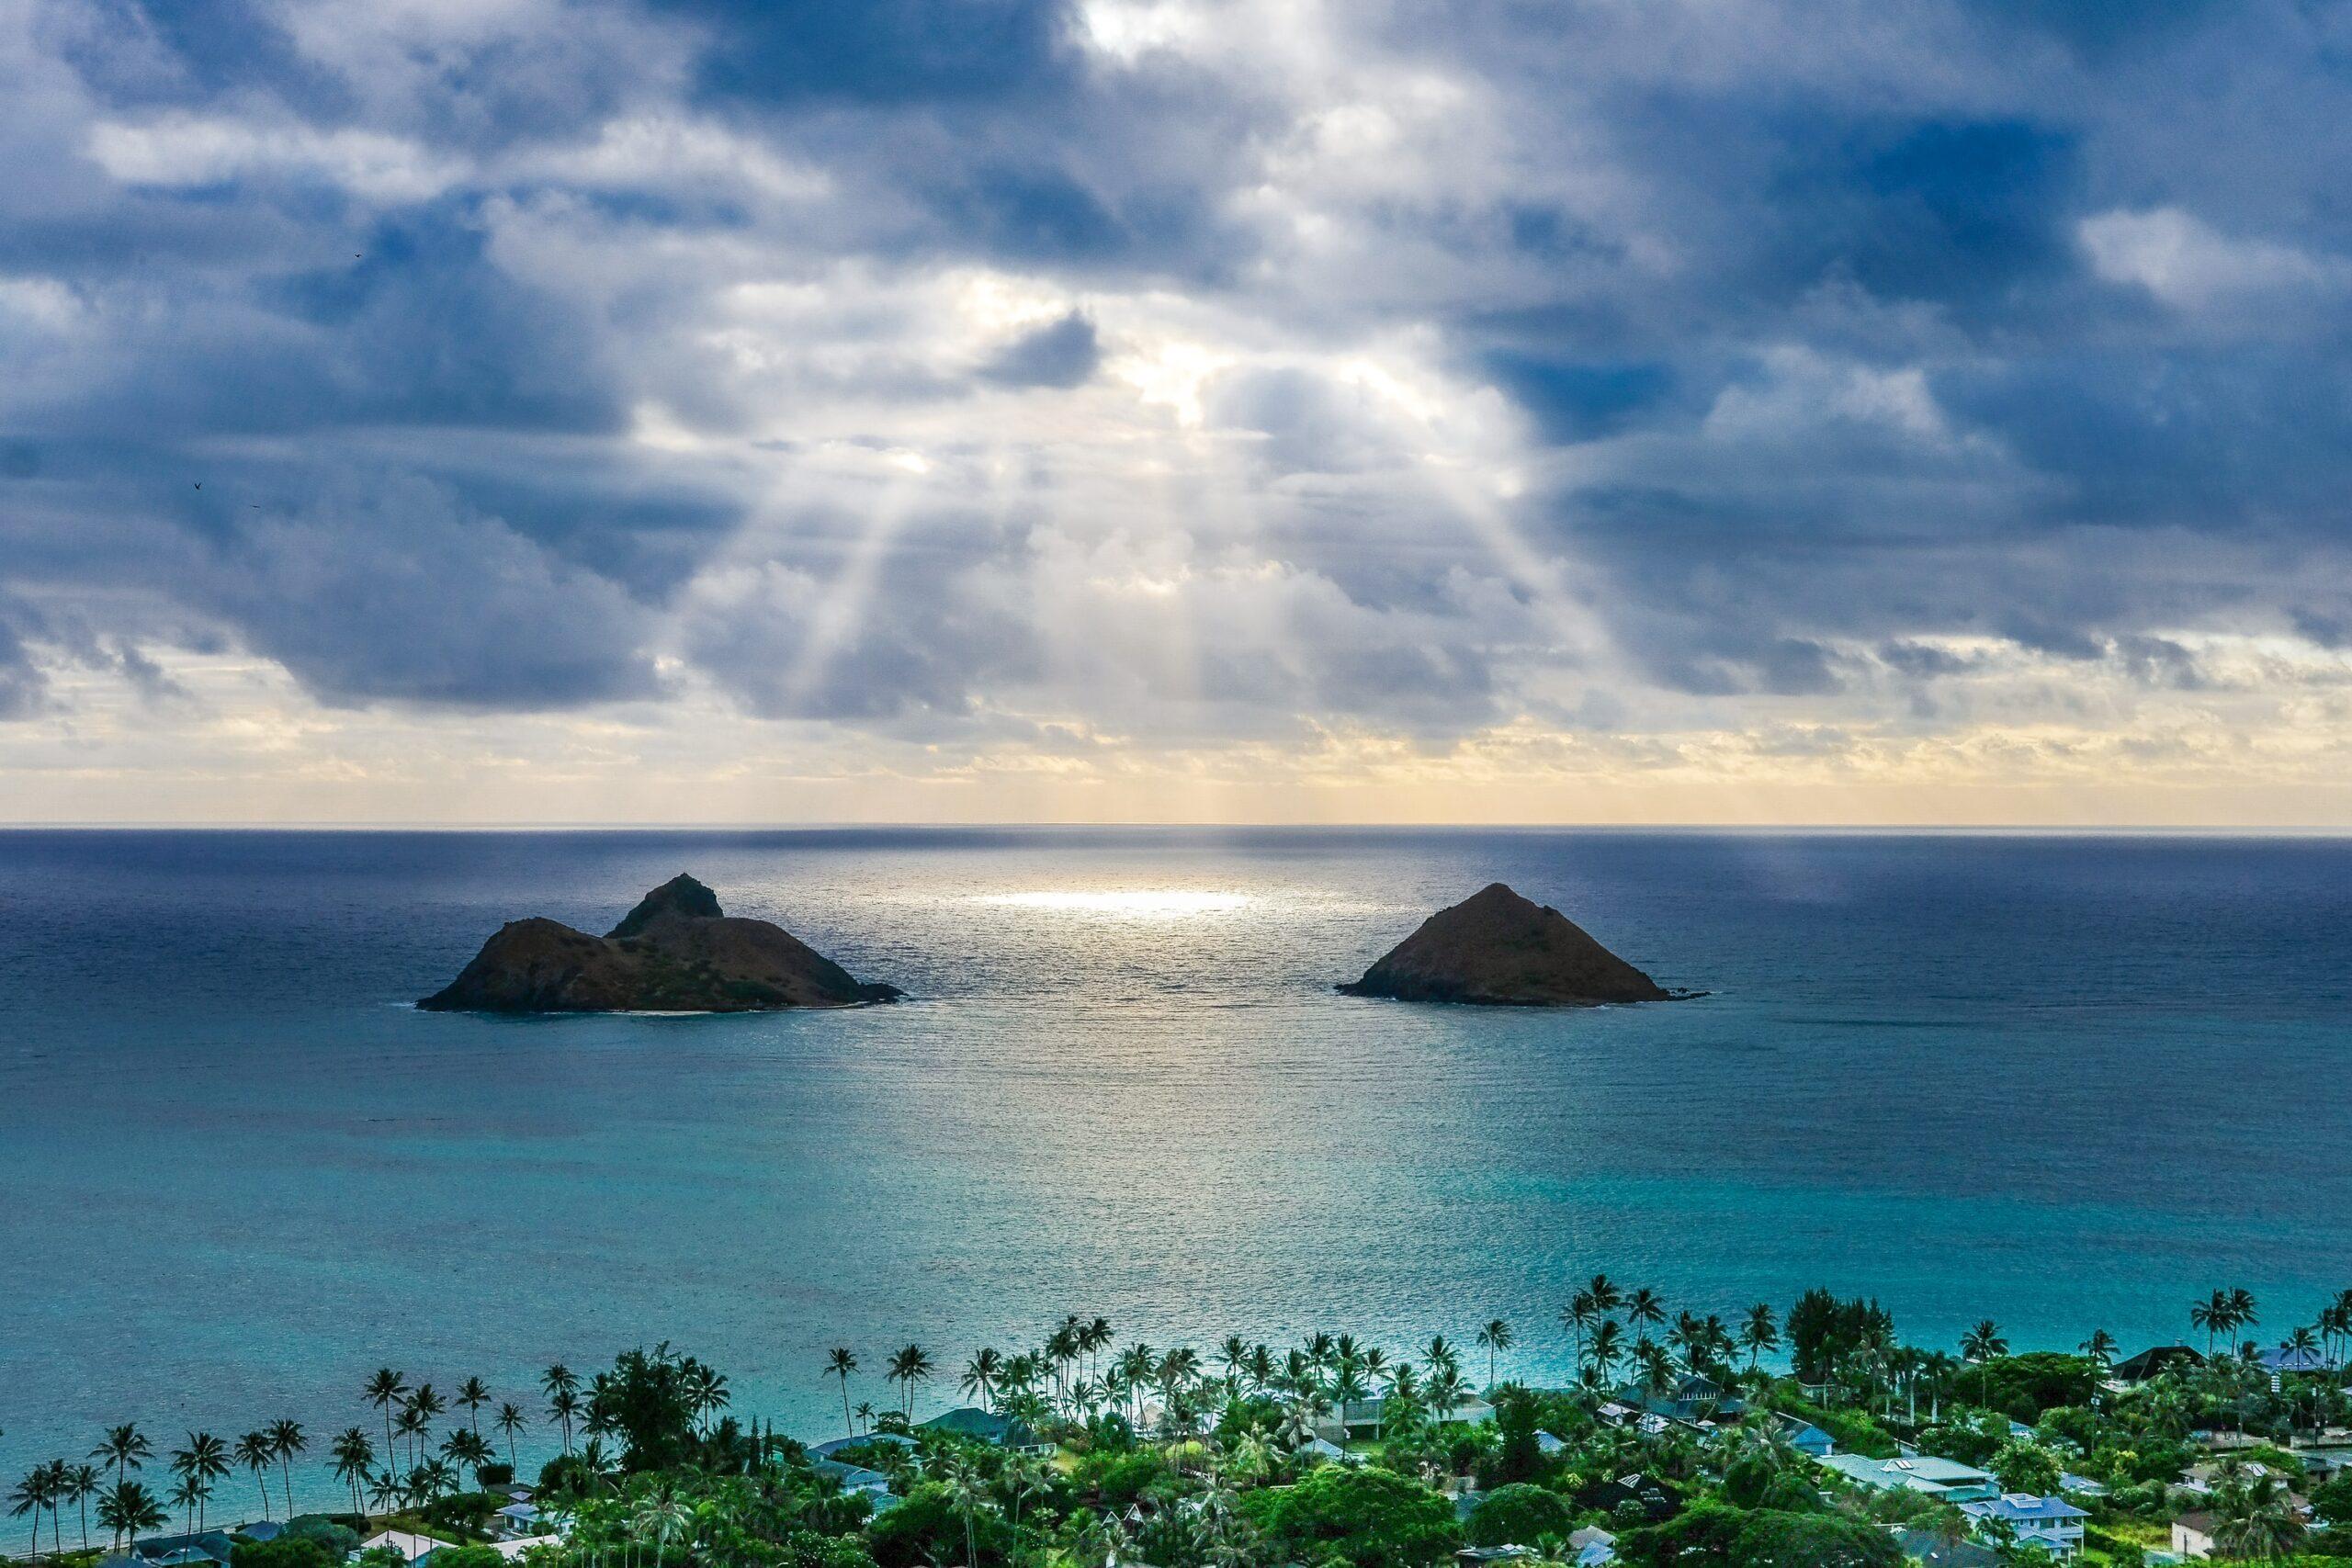 wallpaper Aerial island and beaches